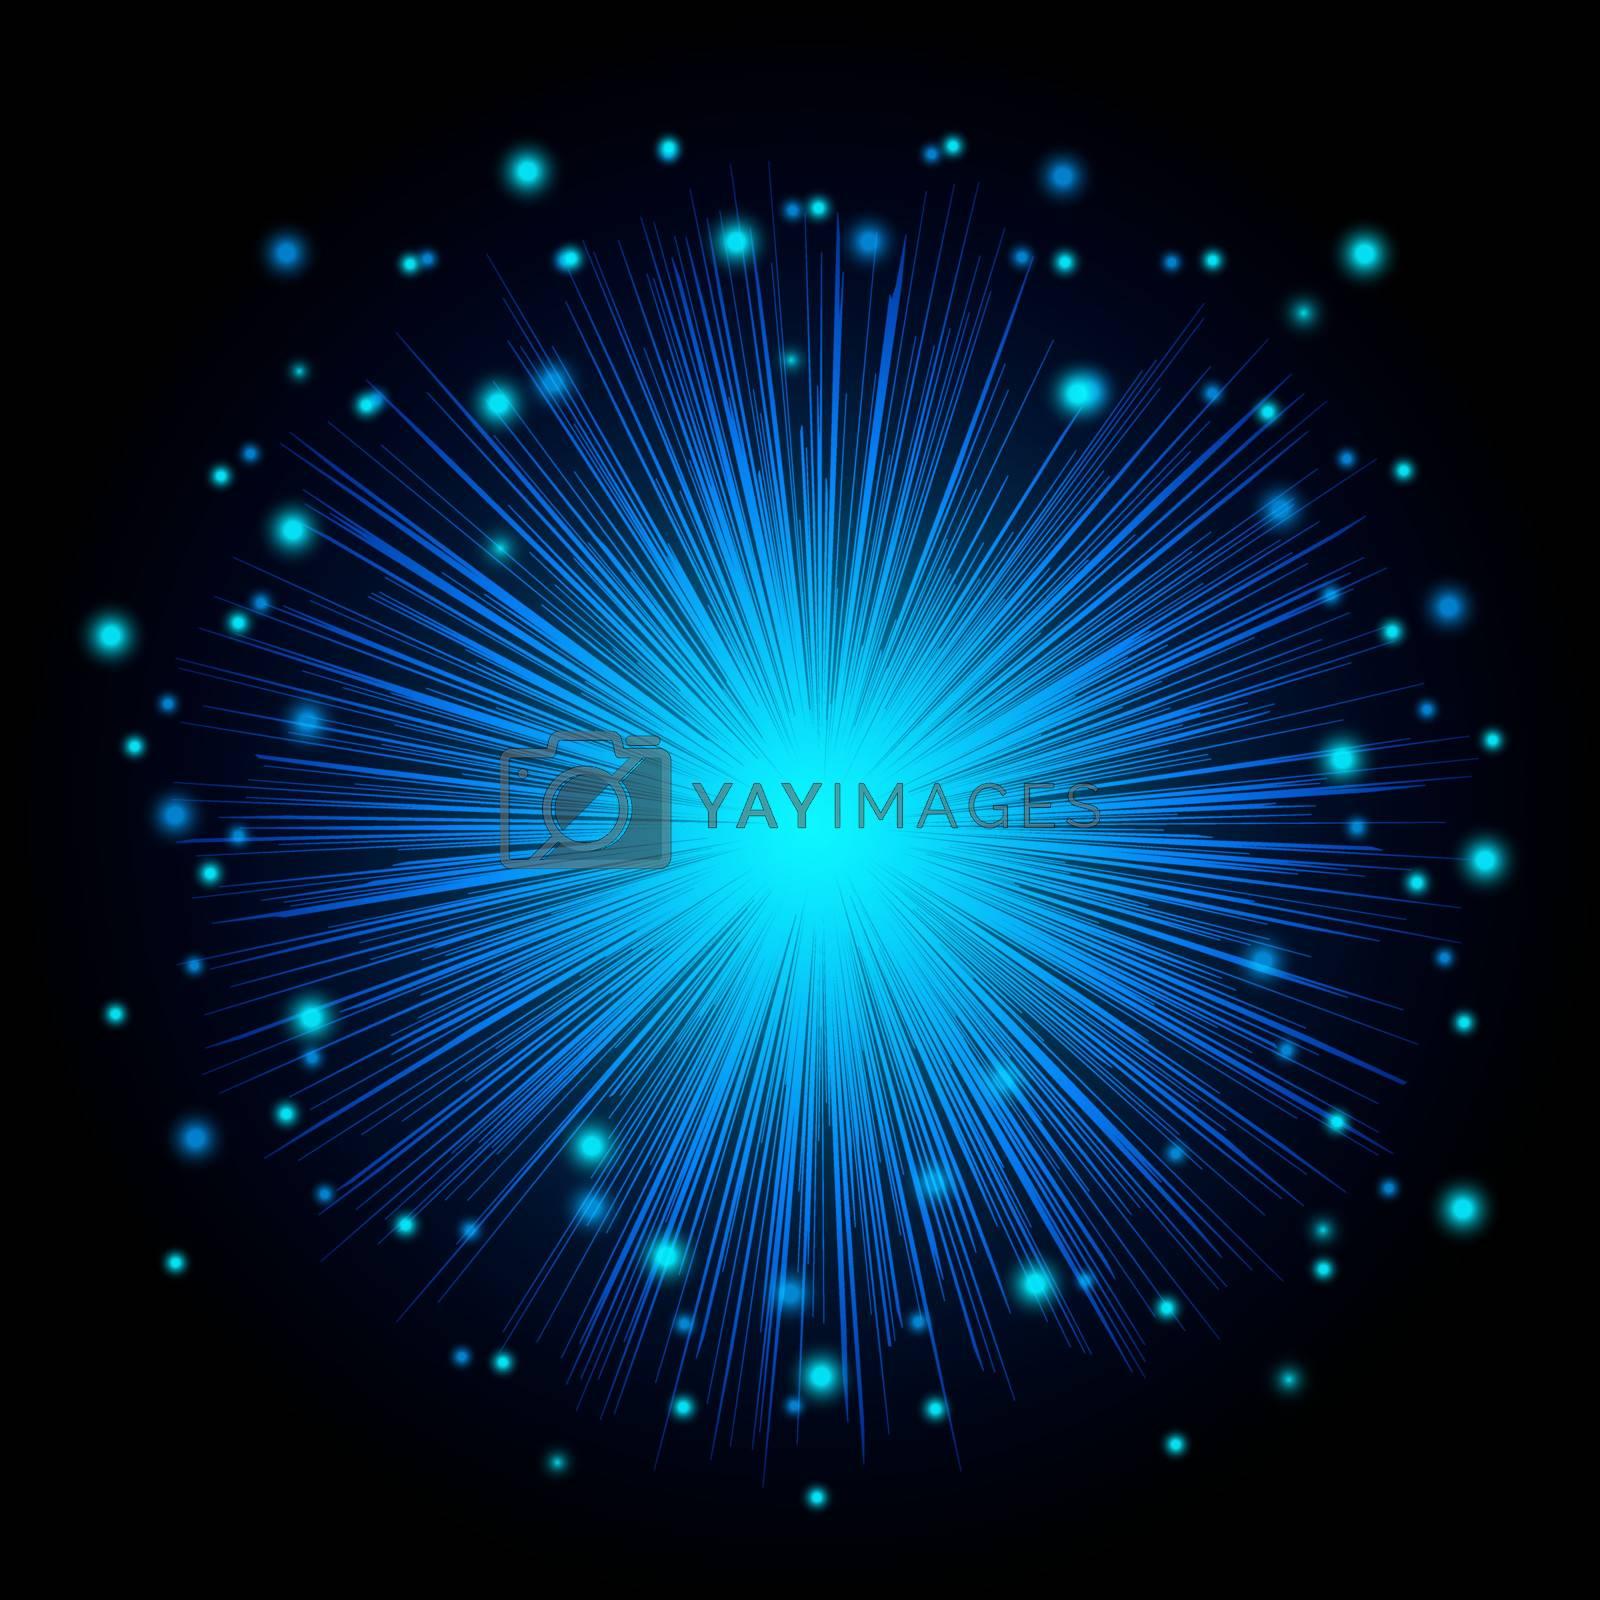 Abstract Led Lighting or Fiber Optical Lights